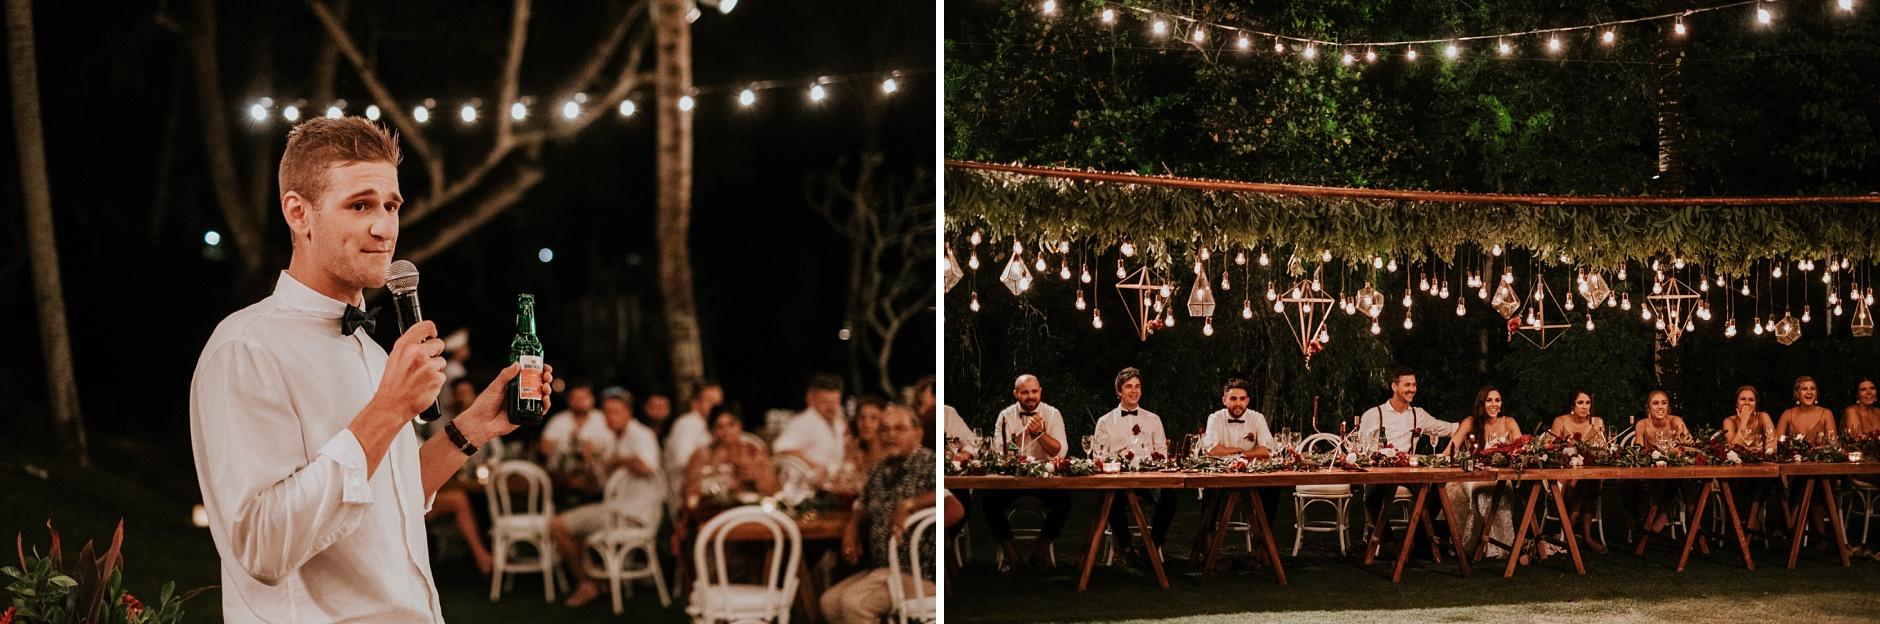 breanna&dan0635a_Bali-Wedding-Photographer.jpg